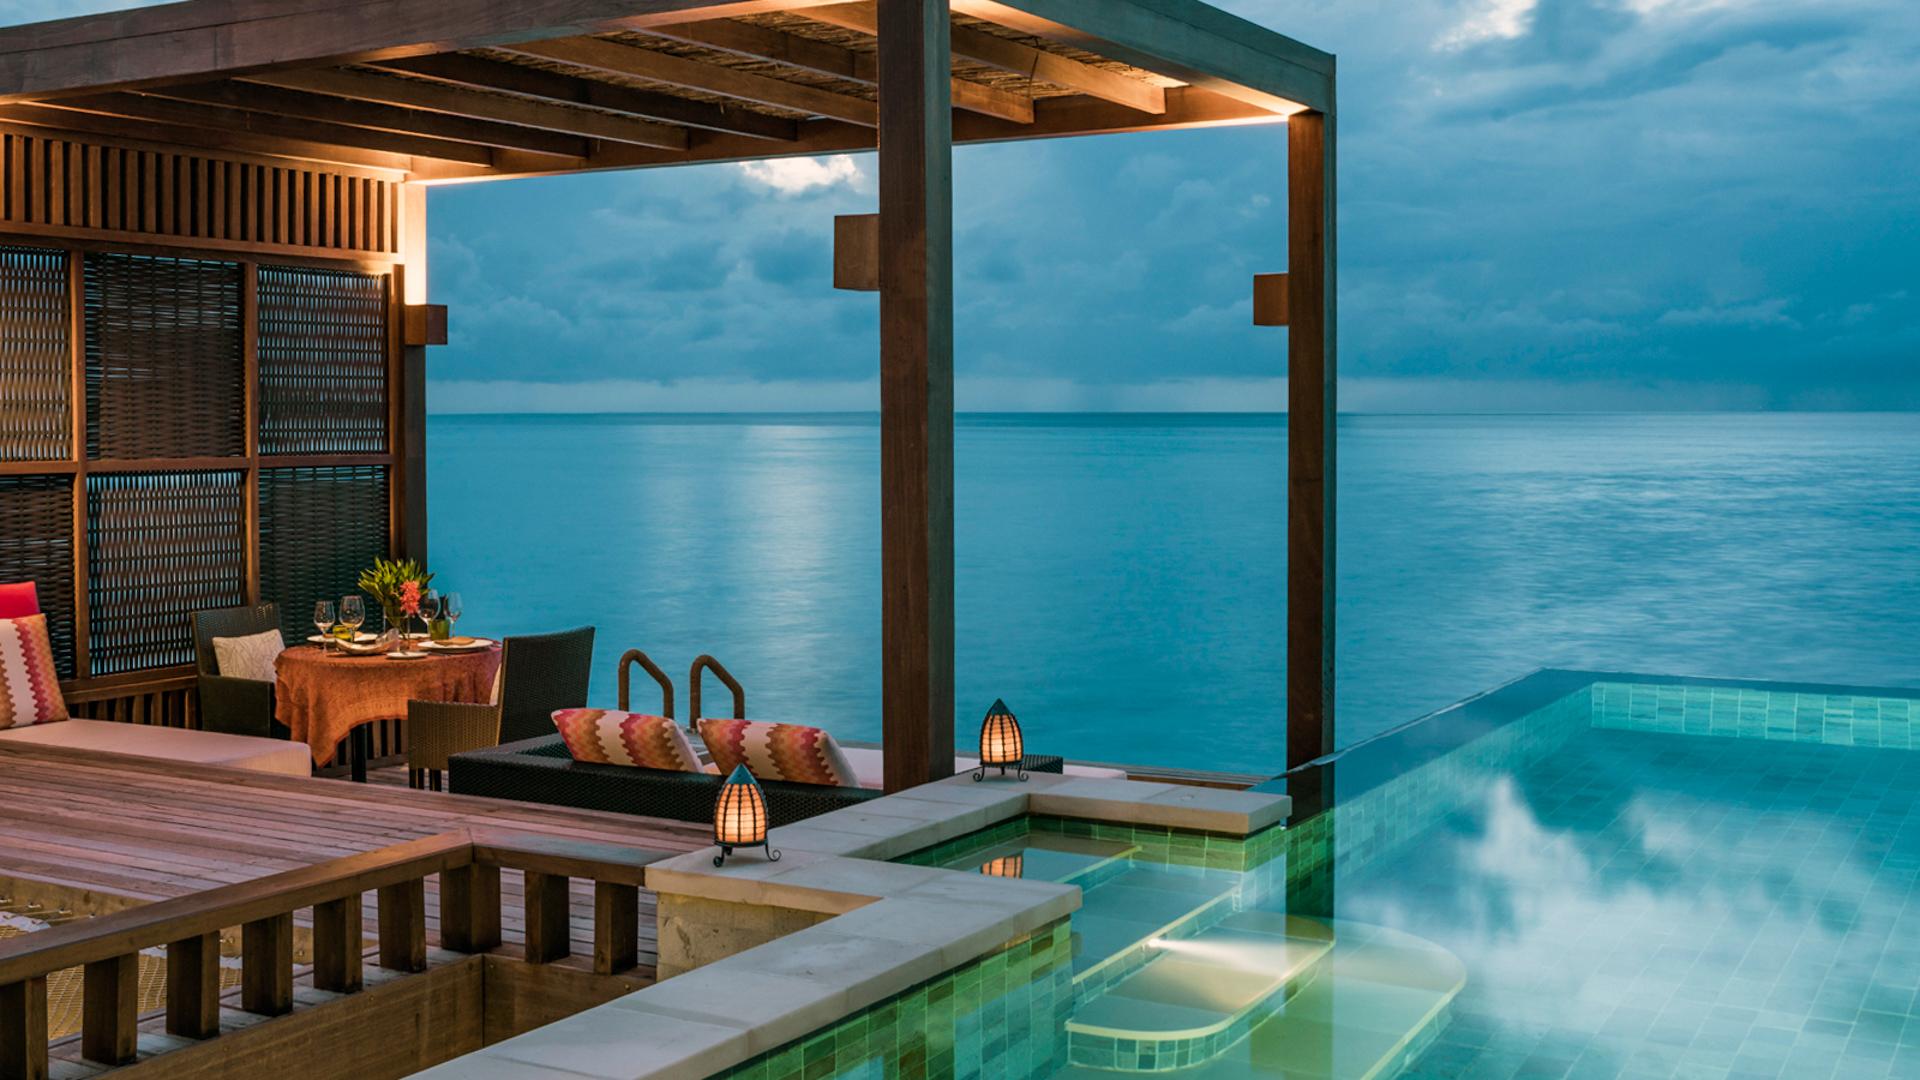 One bedroom water villa. Image courtesy to Four Seasons Kuda Huraa